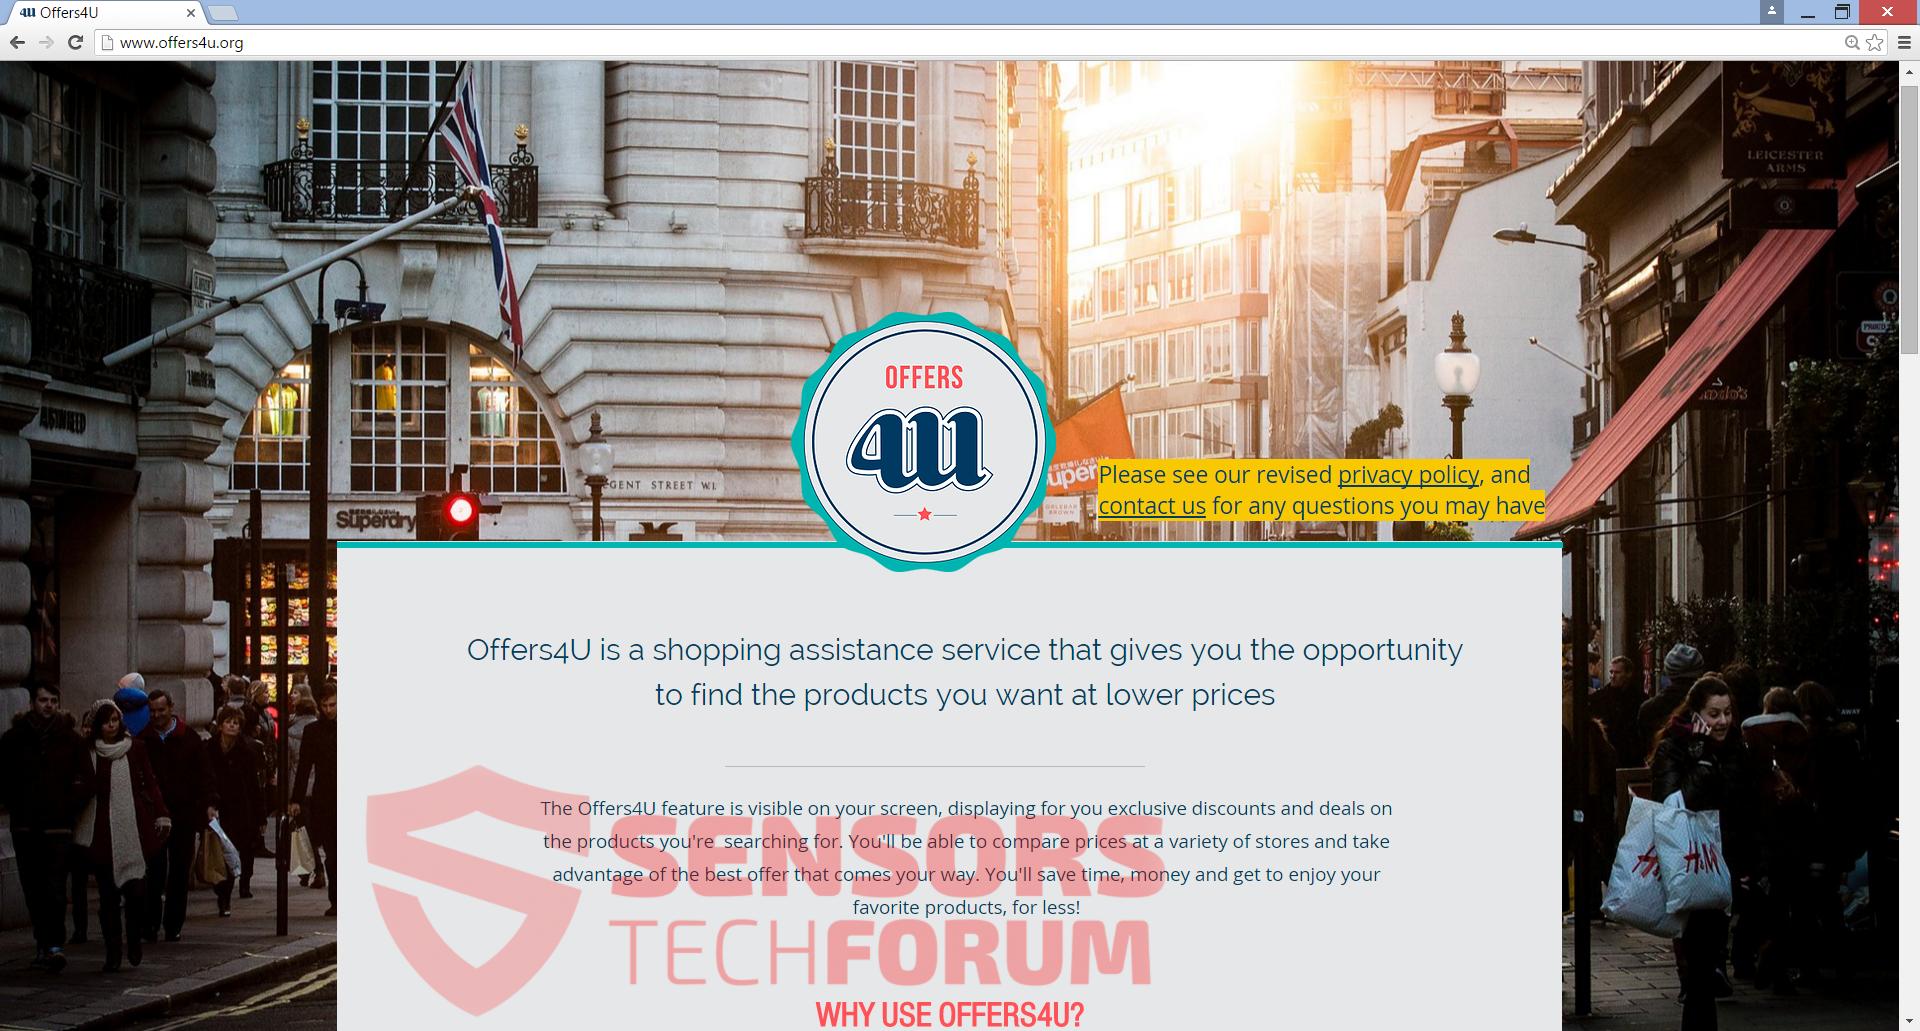 SensorsTechForum-offers4u-offers-4u-official-site-main-page